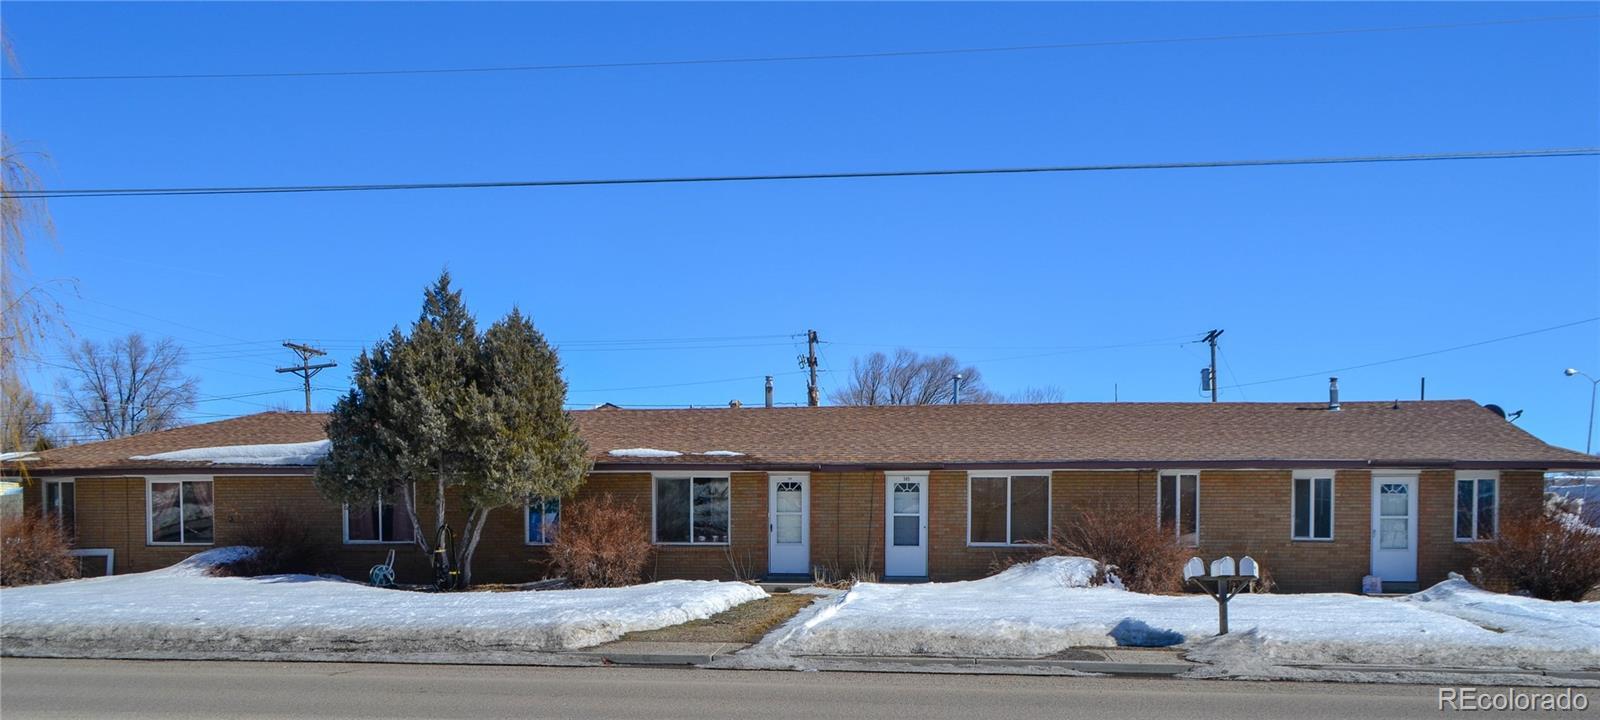 630 W 6th Street Property Photo